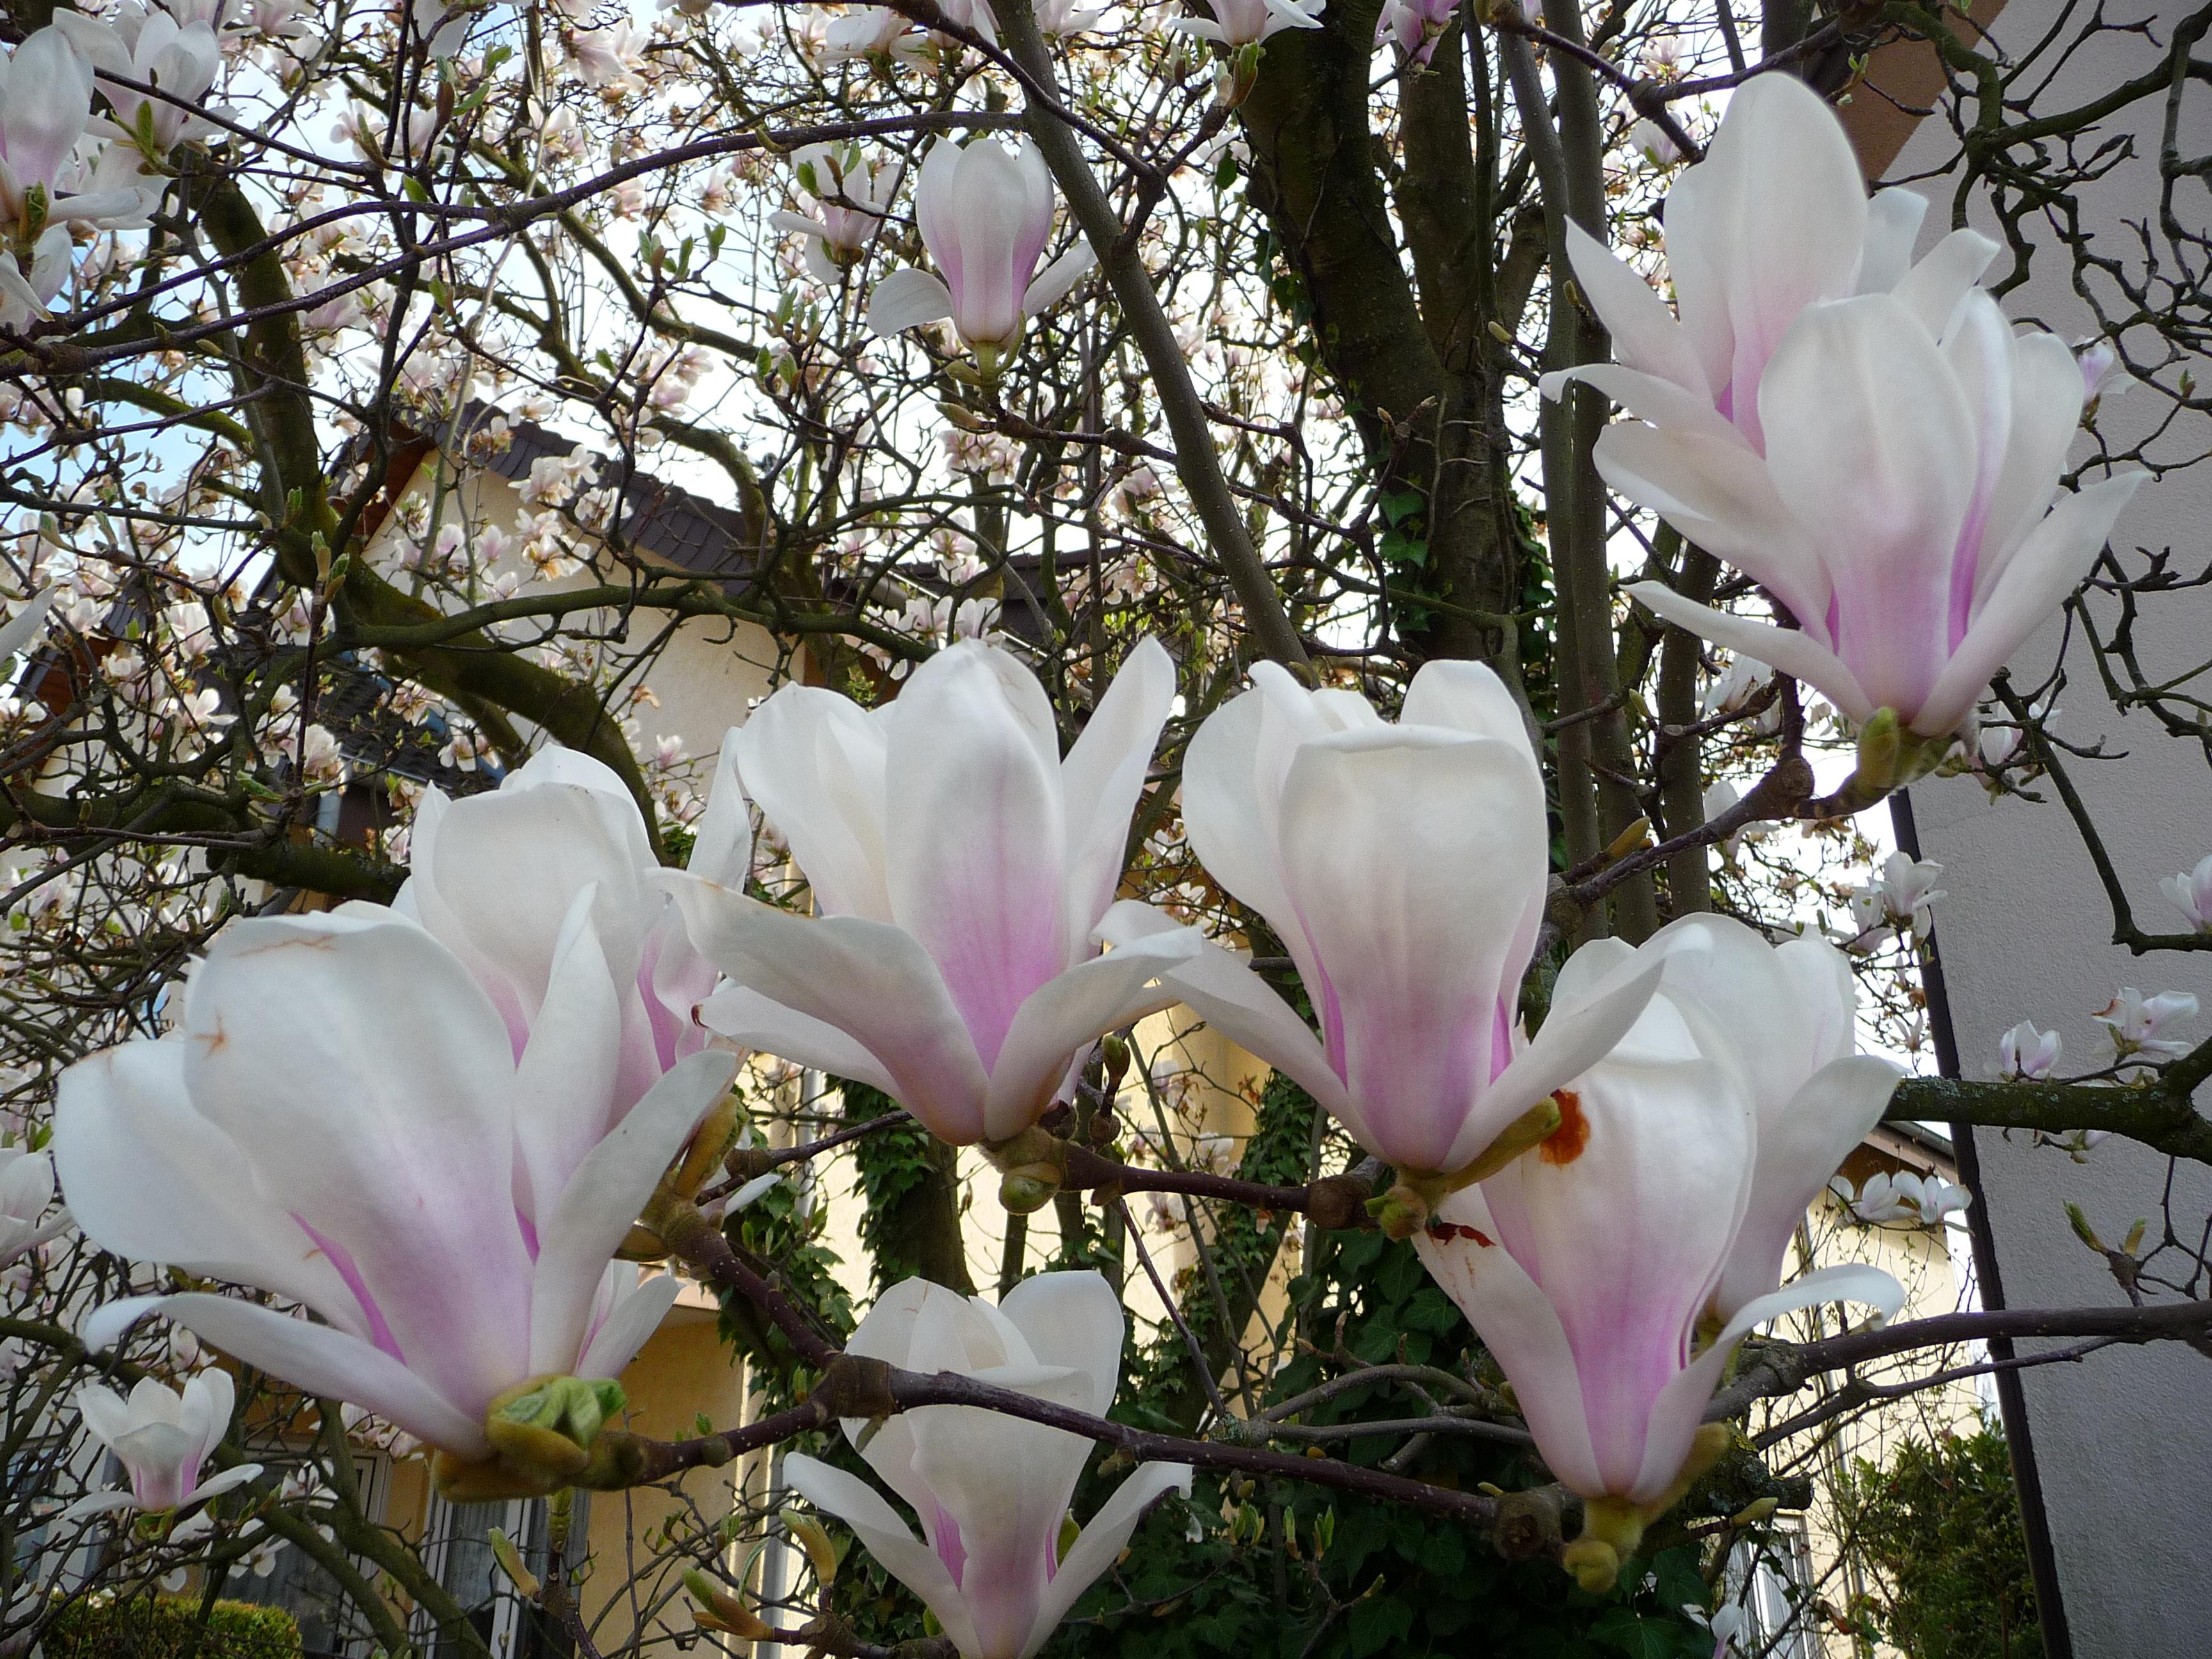 file rosa wei e bl ten magnolie jpg wikimedia commons. Black Bedroom Furniture Sets. Home Design Ideas